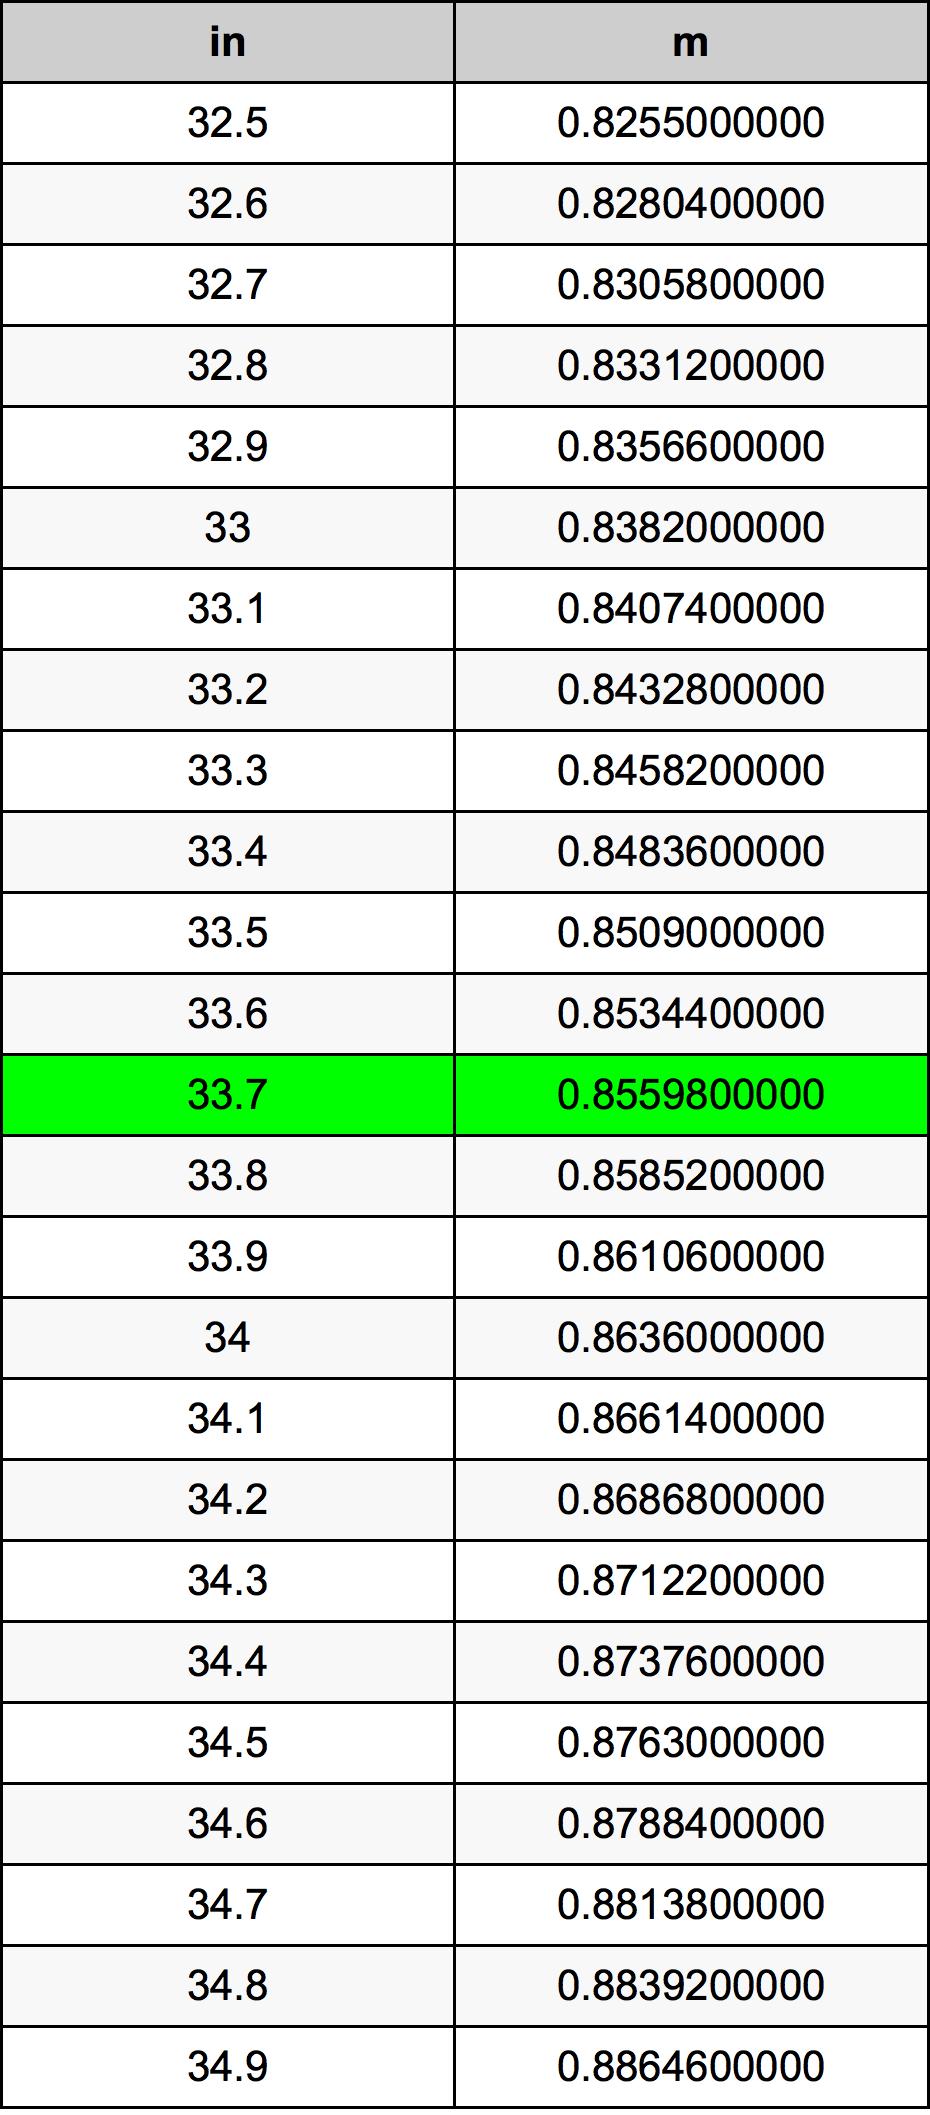 33.7 Inci konversi tabel